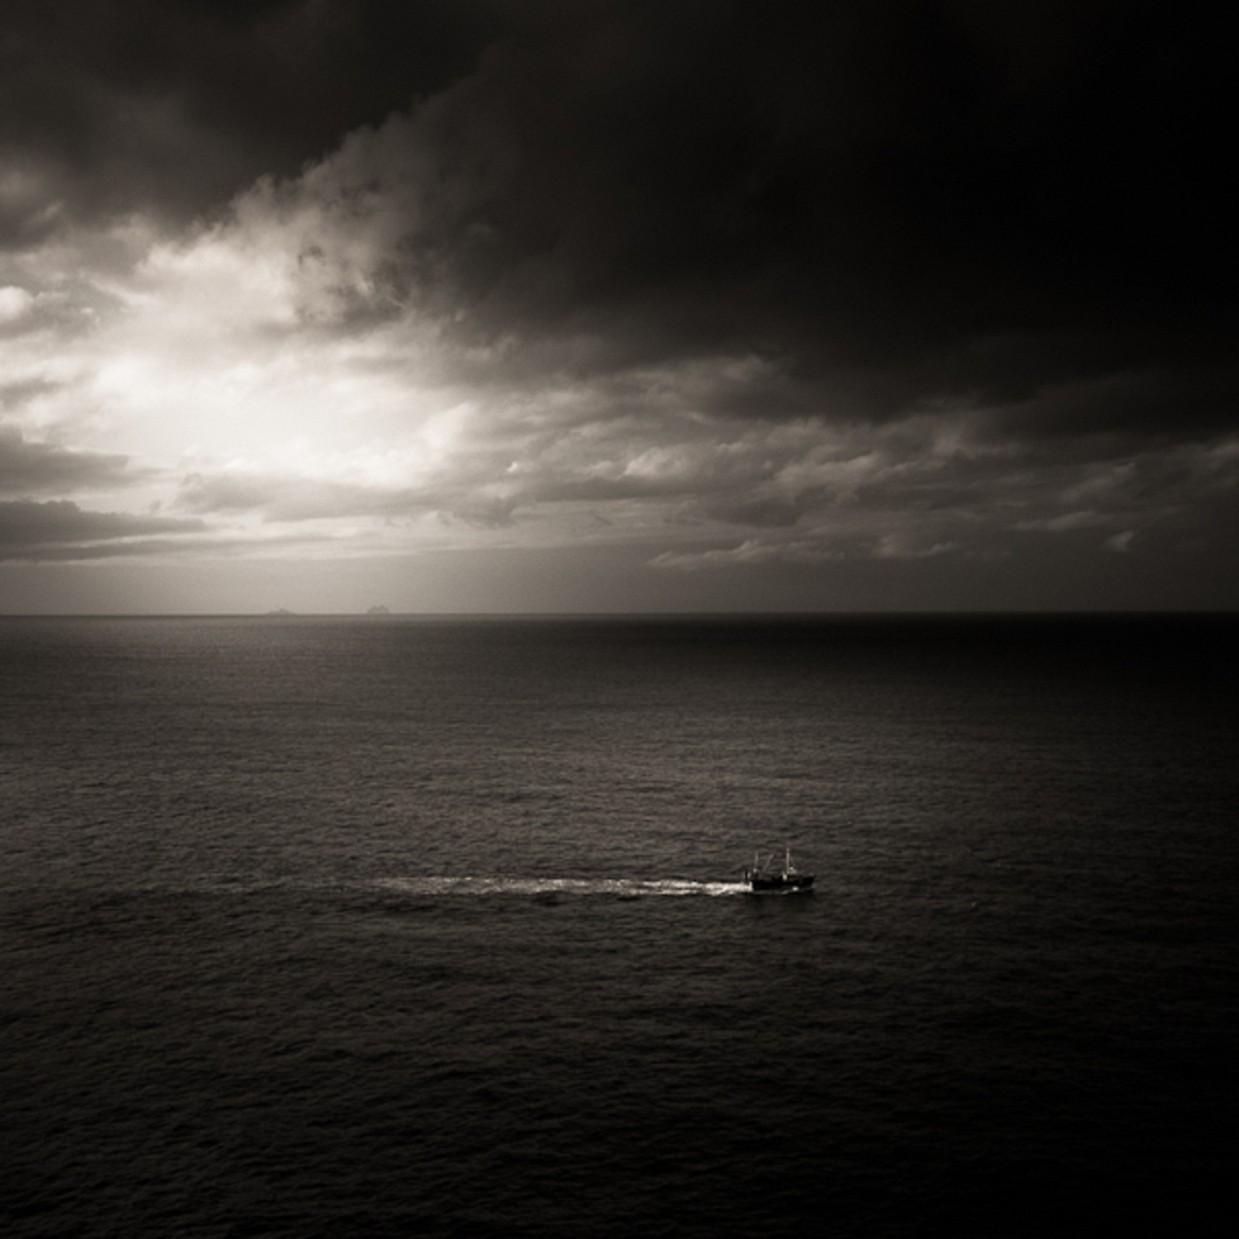 fotograf-Zoltan-Bekefi_6